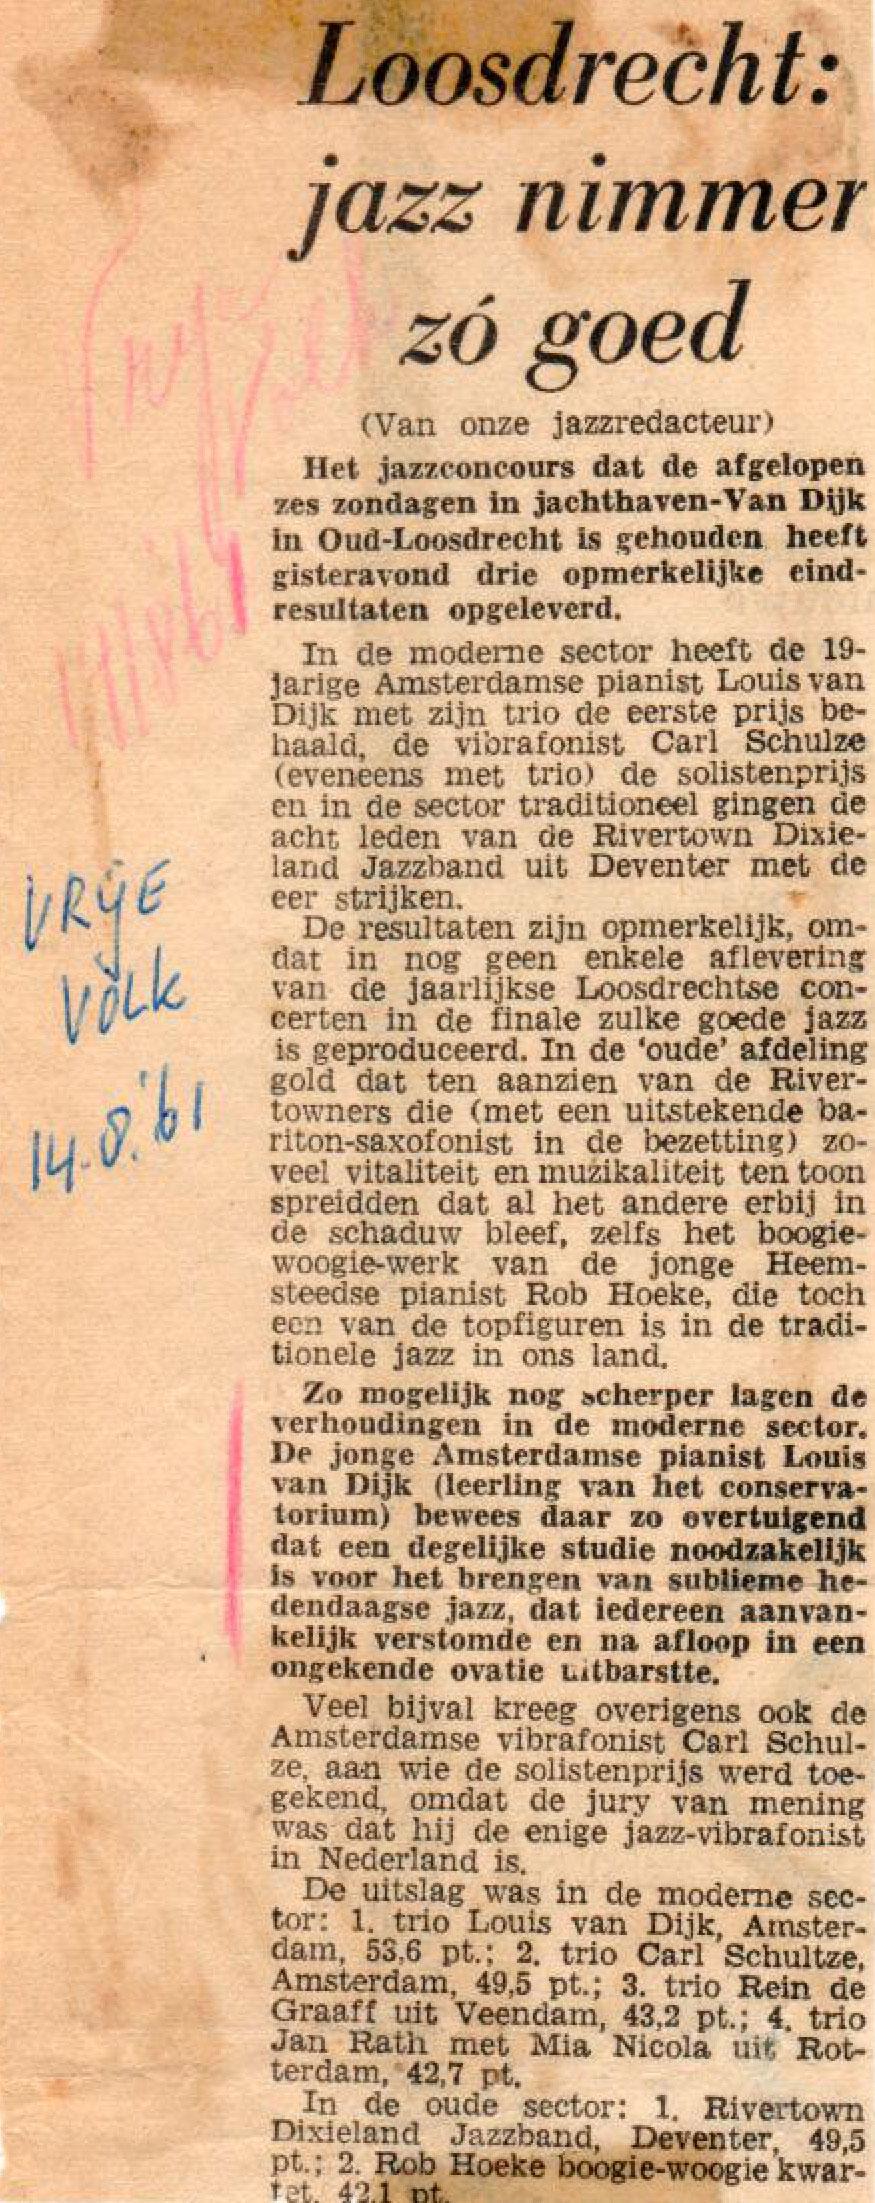 Jazzconcours Loosdrecht 1961